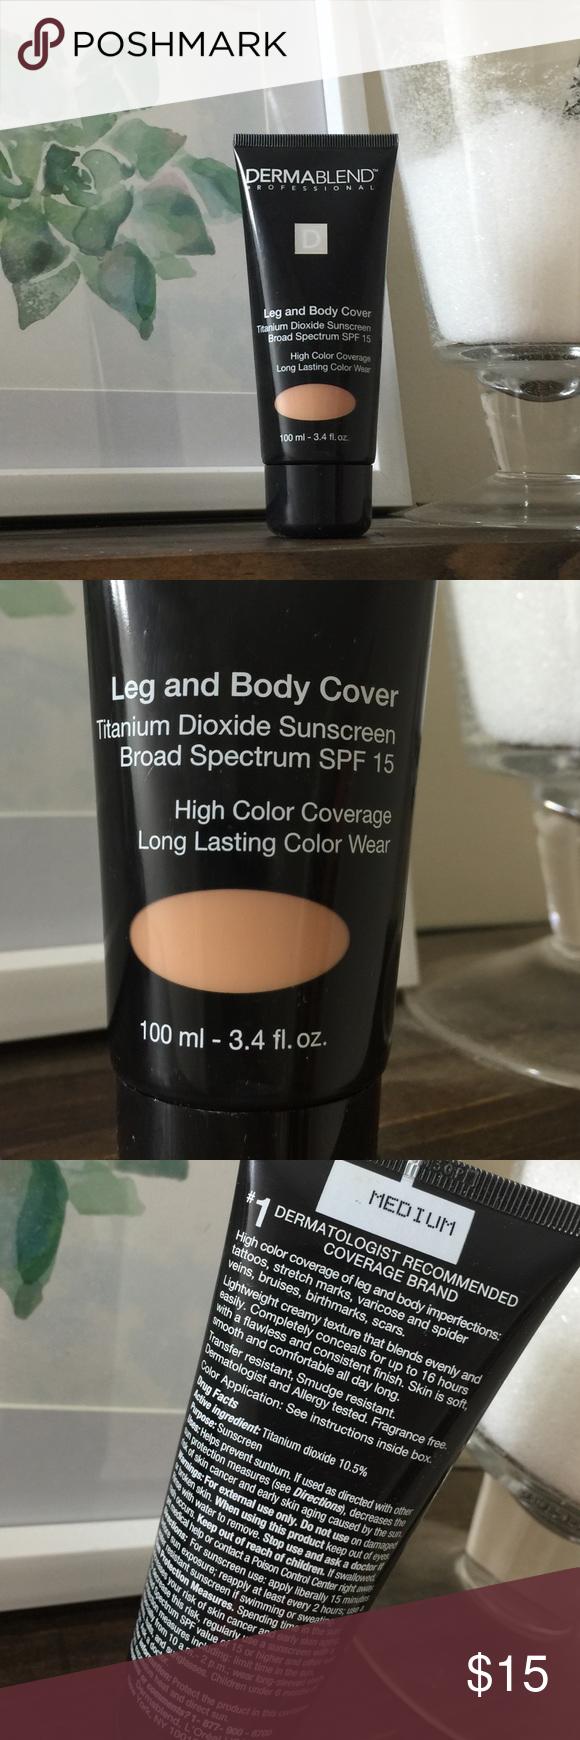 Dermablend Makeup Leg & Body Cover Medium Dermablend